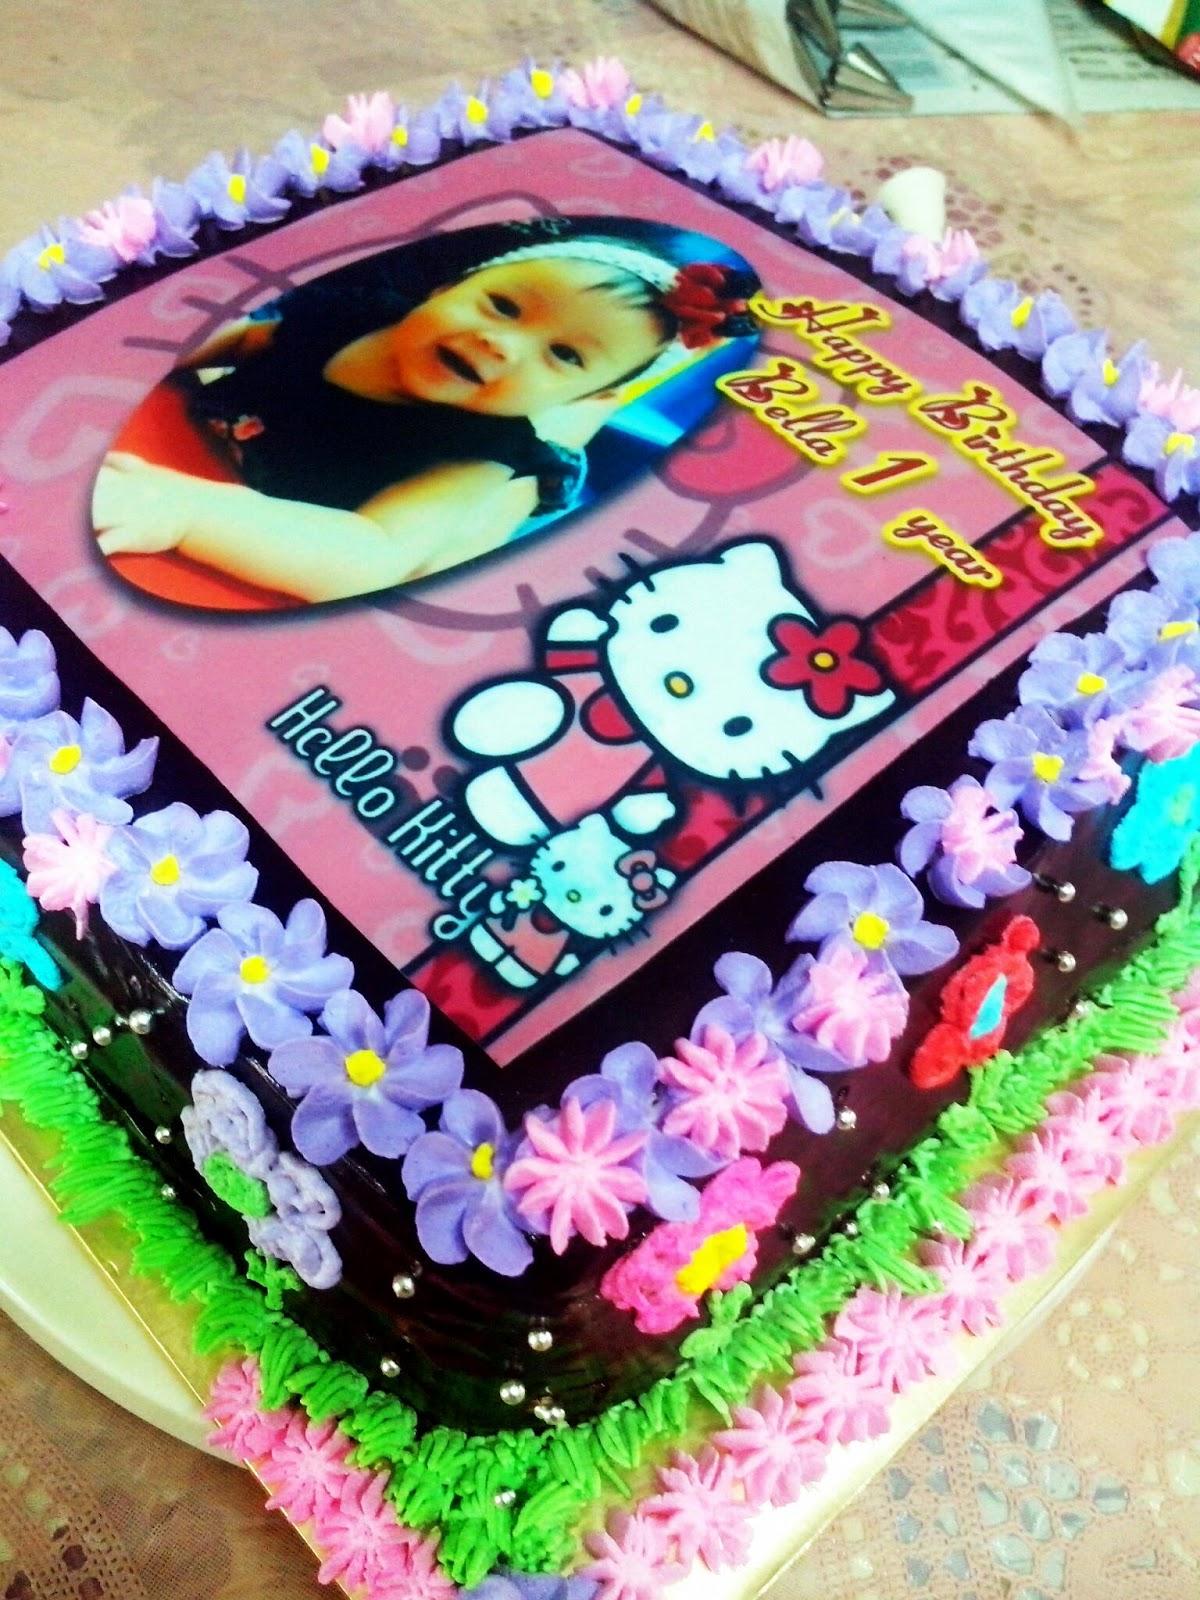 Chocolate Indulgence Cake Birthday Cake Edible Image